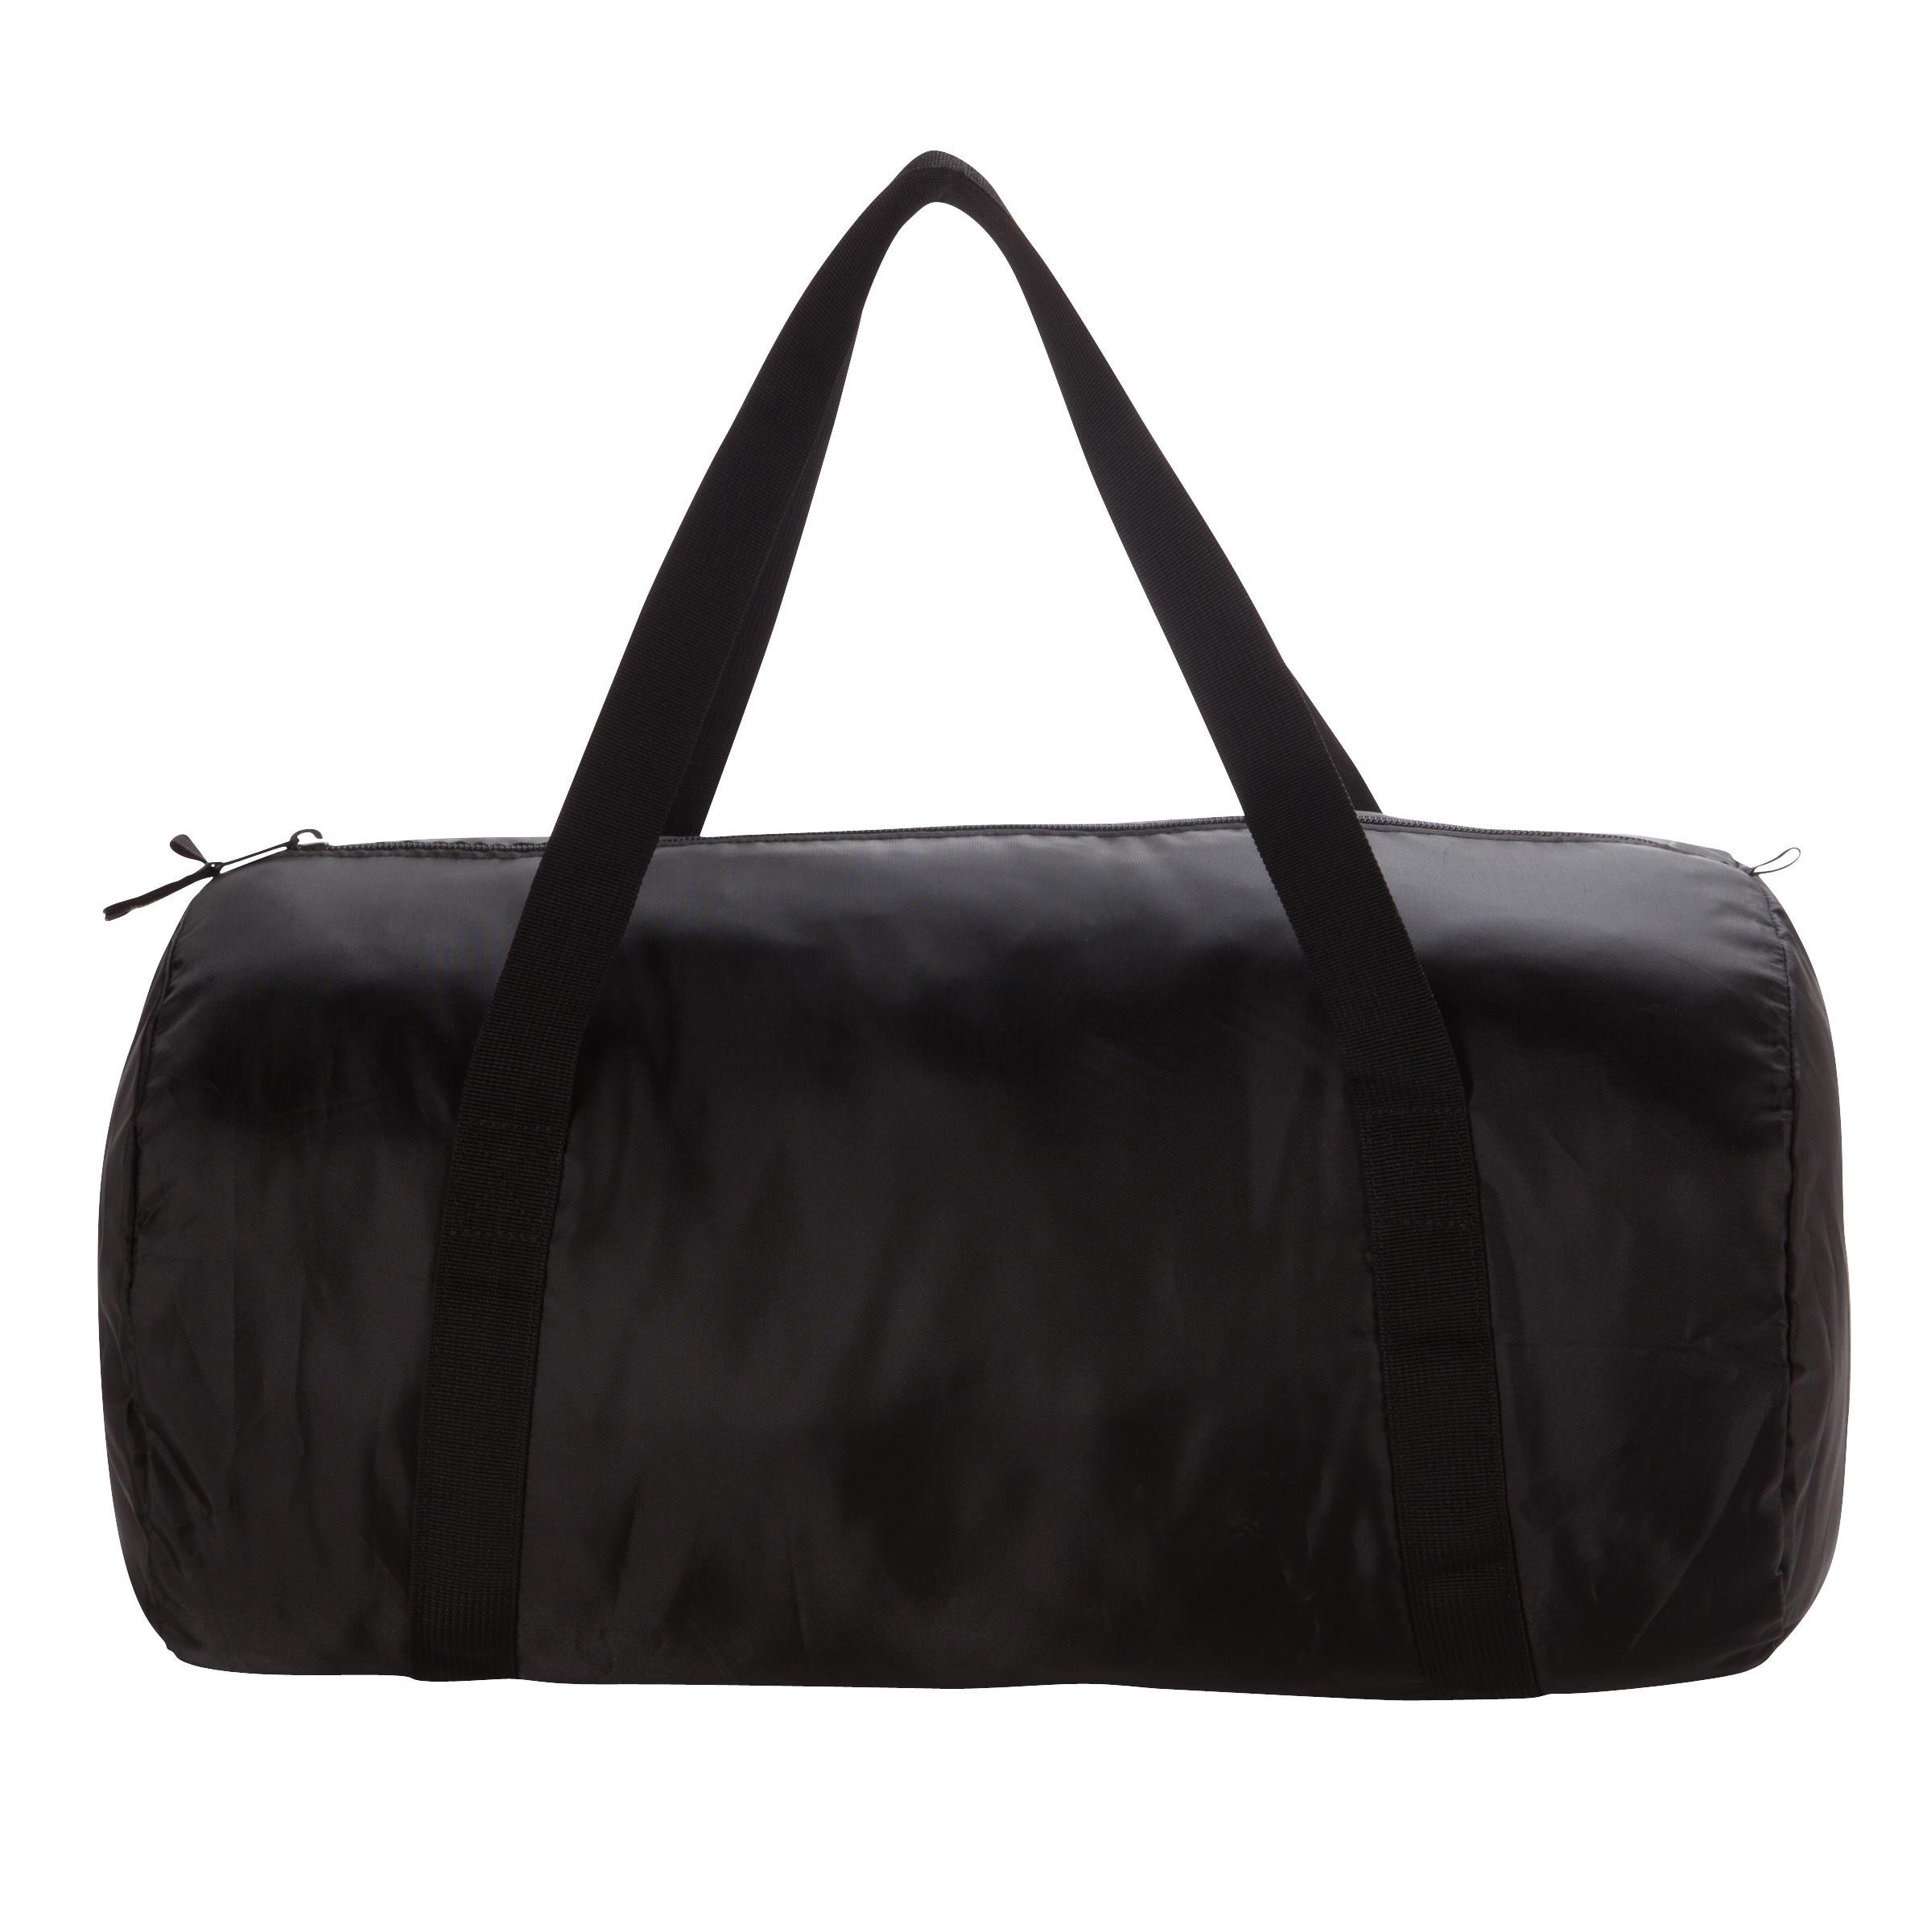 Fold-Down Cardio Fitness Bag 30L - Black